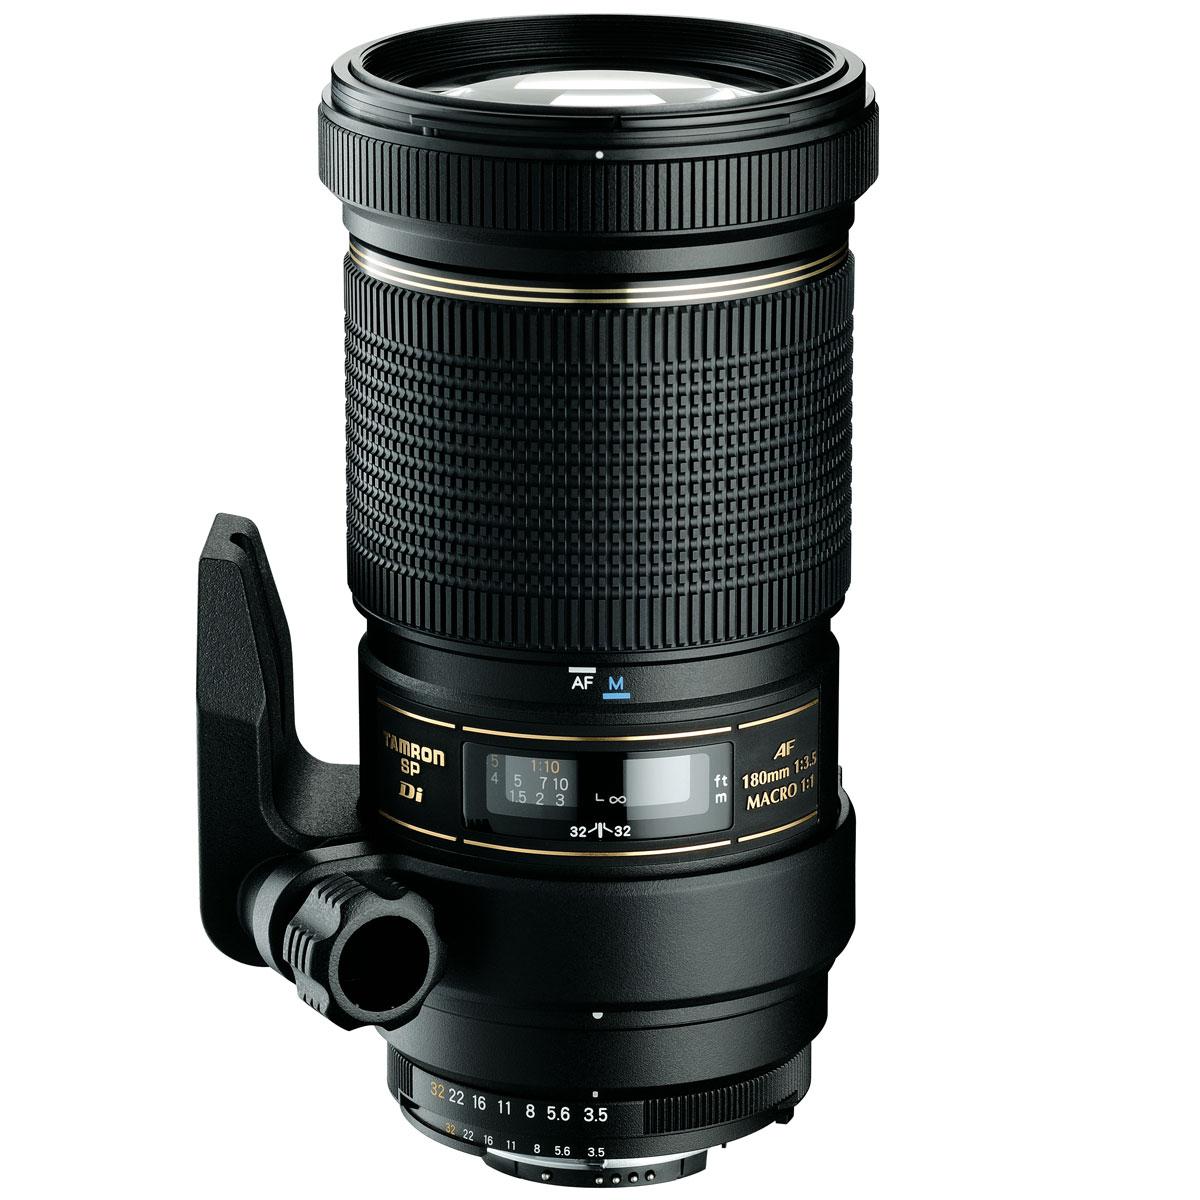 Tamron SP AF 180mm F/3.5 Di LD Macro, Sony объектив cp32 4 180mm